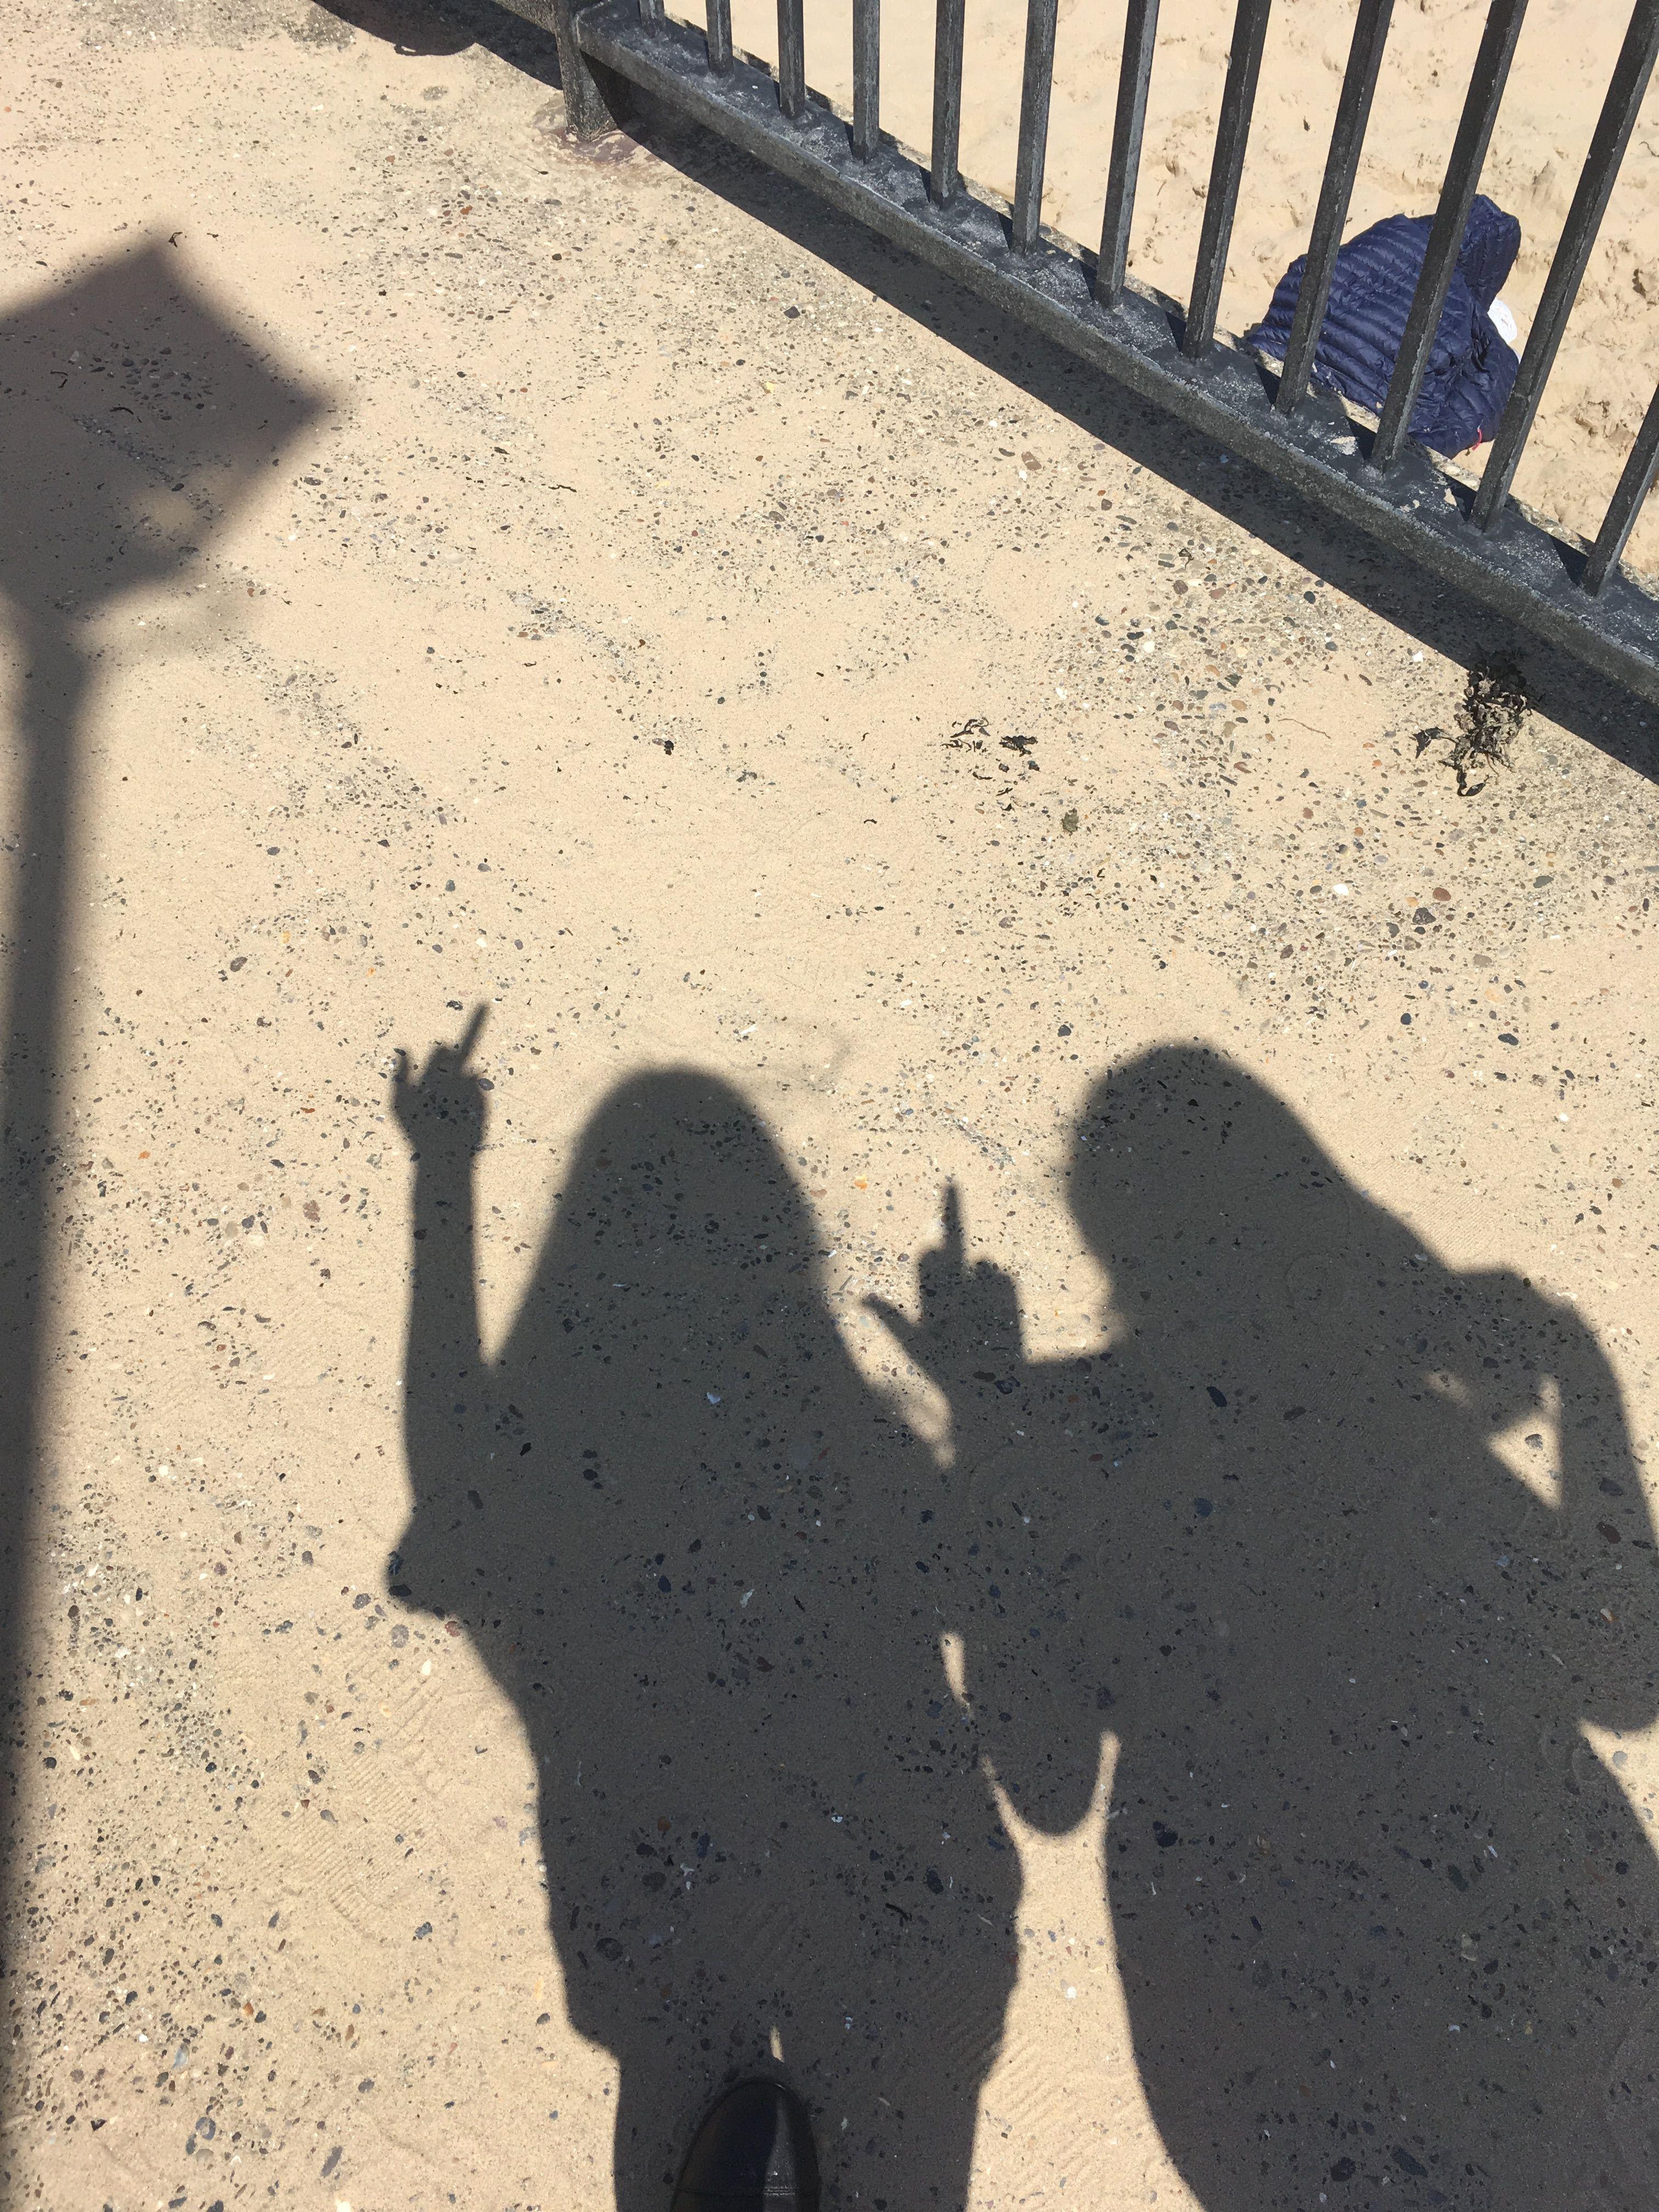 Shadow Shadows Friends Friendship Middlefinger Sand Beach Railing Metal Shadow Pictures Beach Pictures Friends Girl Shadow